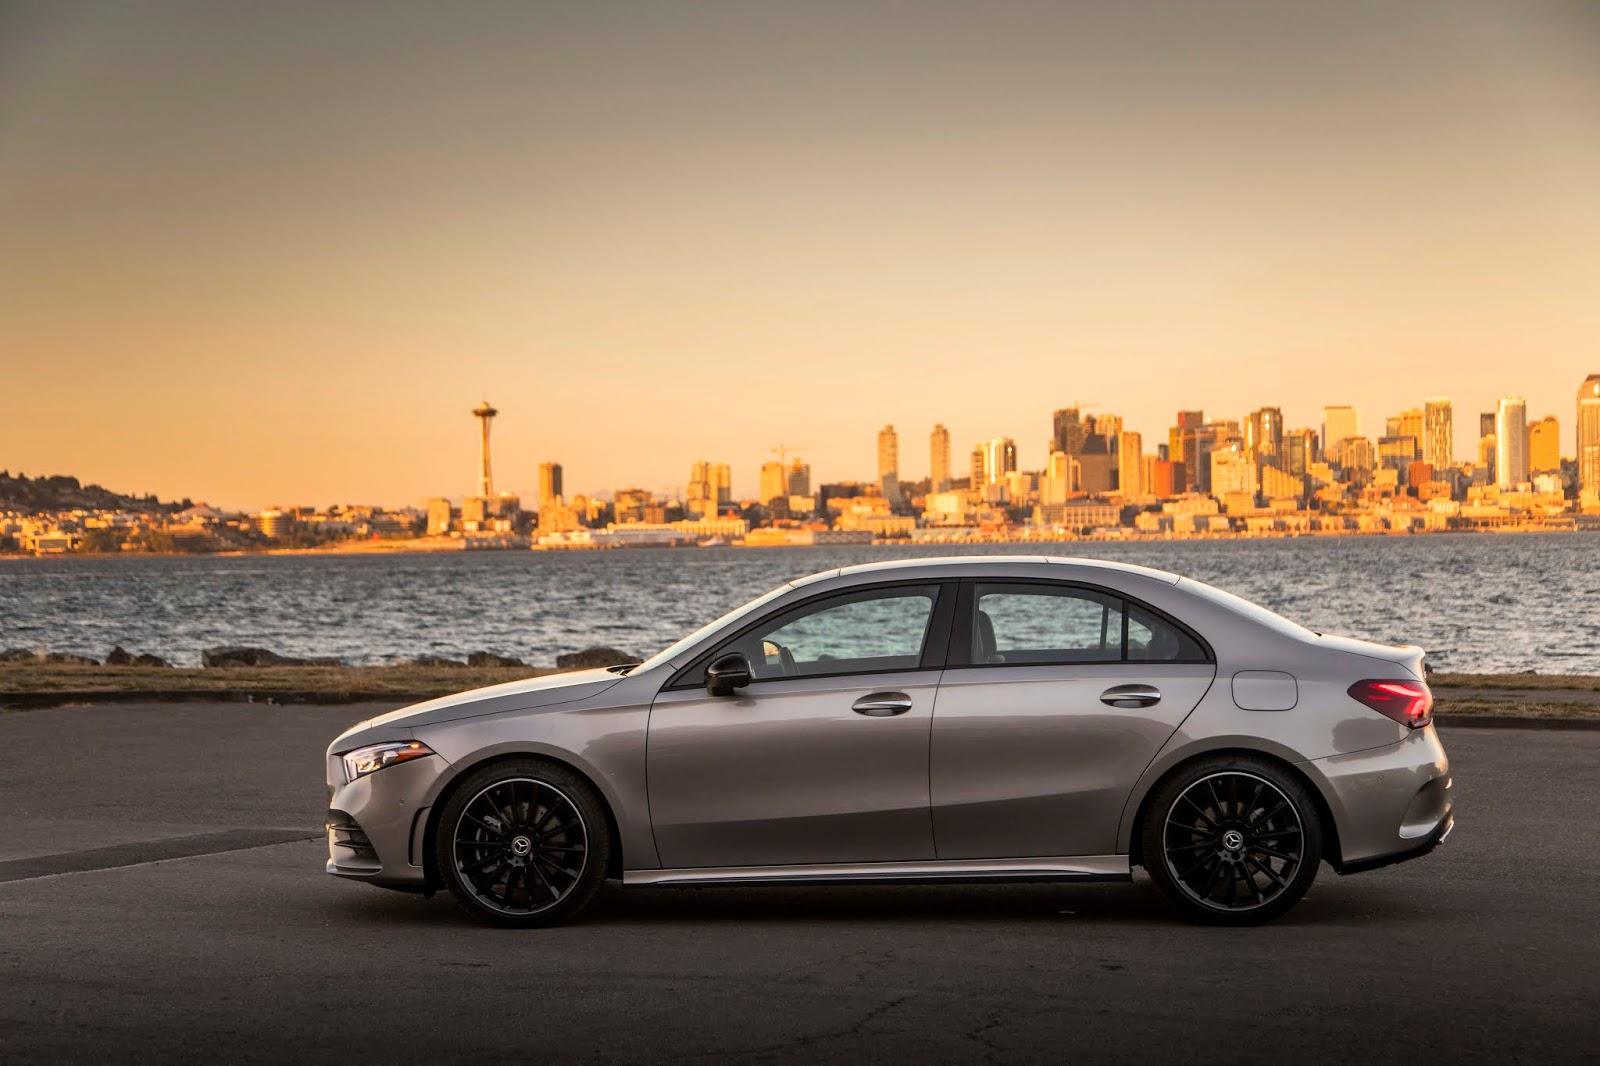 18C0777 007 Από 28.230 ευρώ η τιμή της Mercedes A-Class Sedan Luxury sedan, Mercedes, Mercedes AMG, premium sedan, sedan, zblog, καινούργιο, καινούρια, τιμες